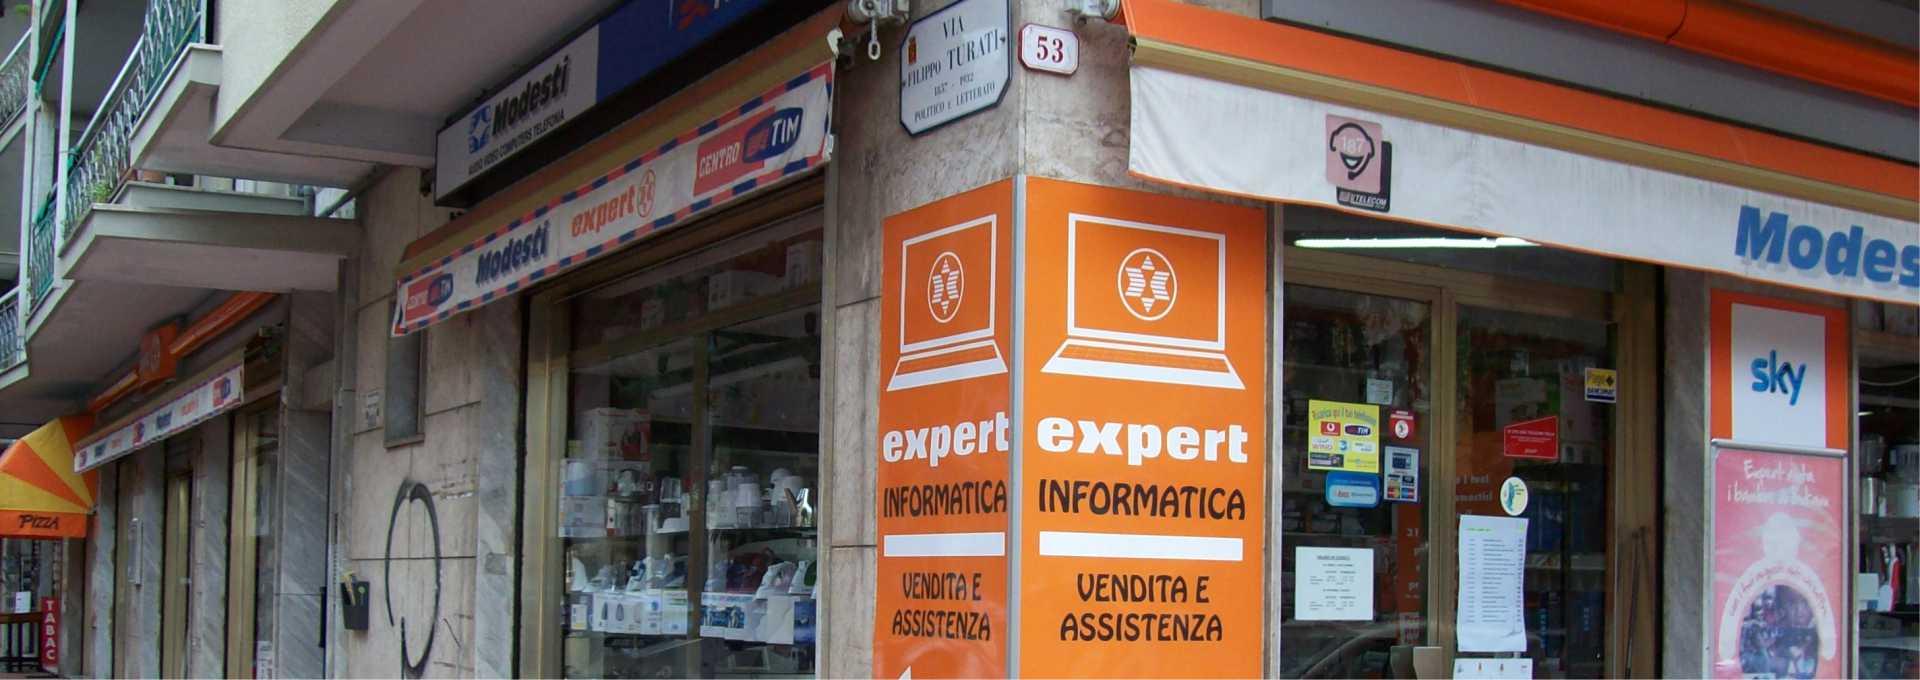 Vendita Elettrodomestici Ventimiglia (Imperia) Vintimille Costra Azzurra | vendita TV Hi Fi Informatica Telefonia Ventimiglia Vintimille Imperia Costa Azzurra